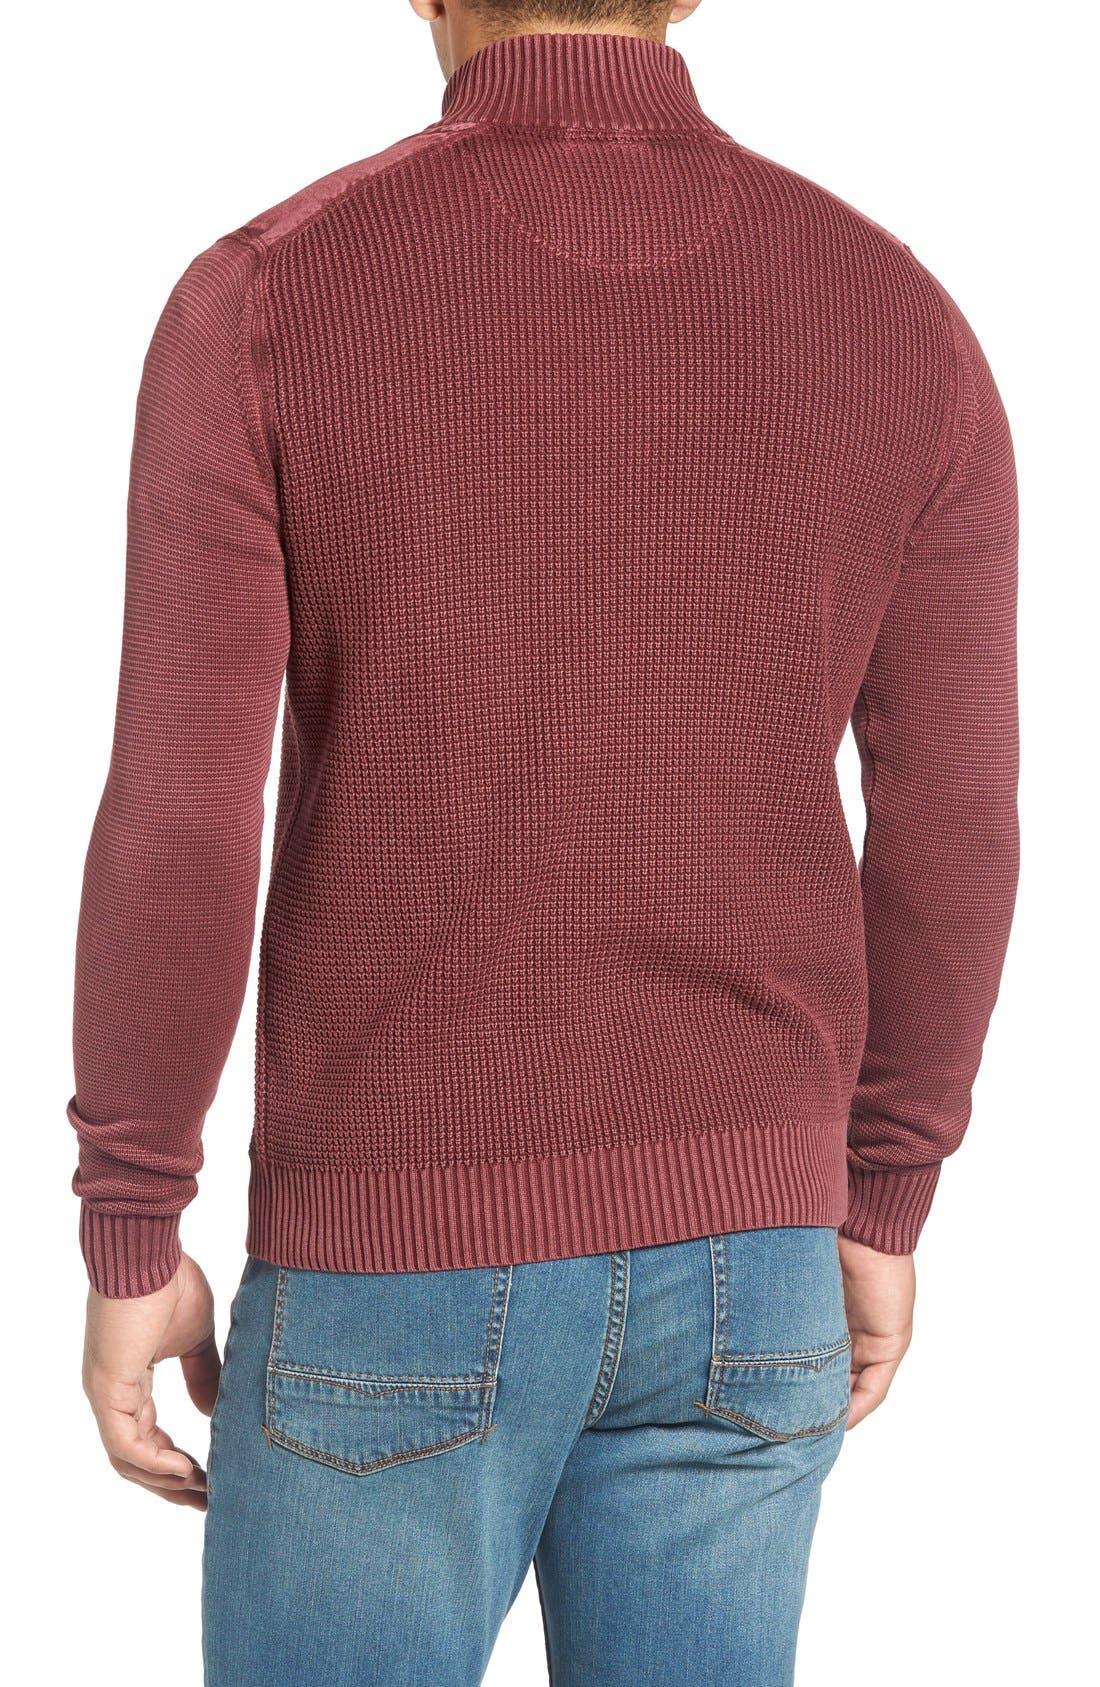 Coastal Shores Quarter Zip Sweater,                             Alternate thumbnail 18, color,